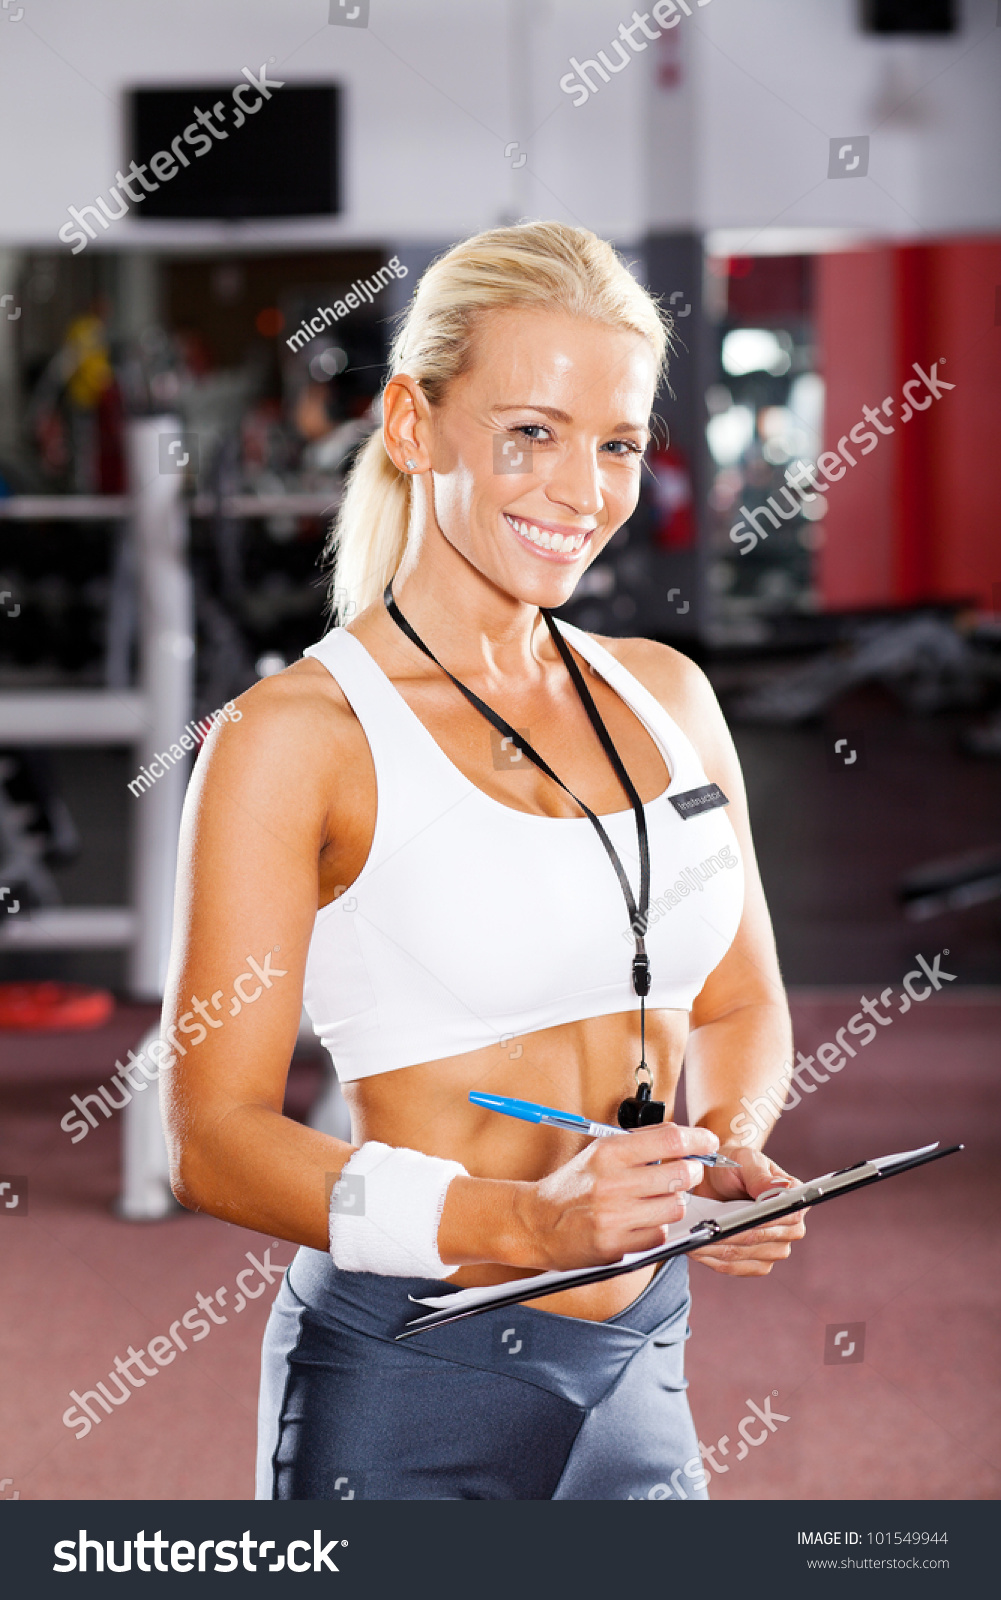 Happy Female Gym Instructor Portrait Stock Photo 101549944 ...